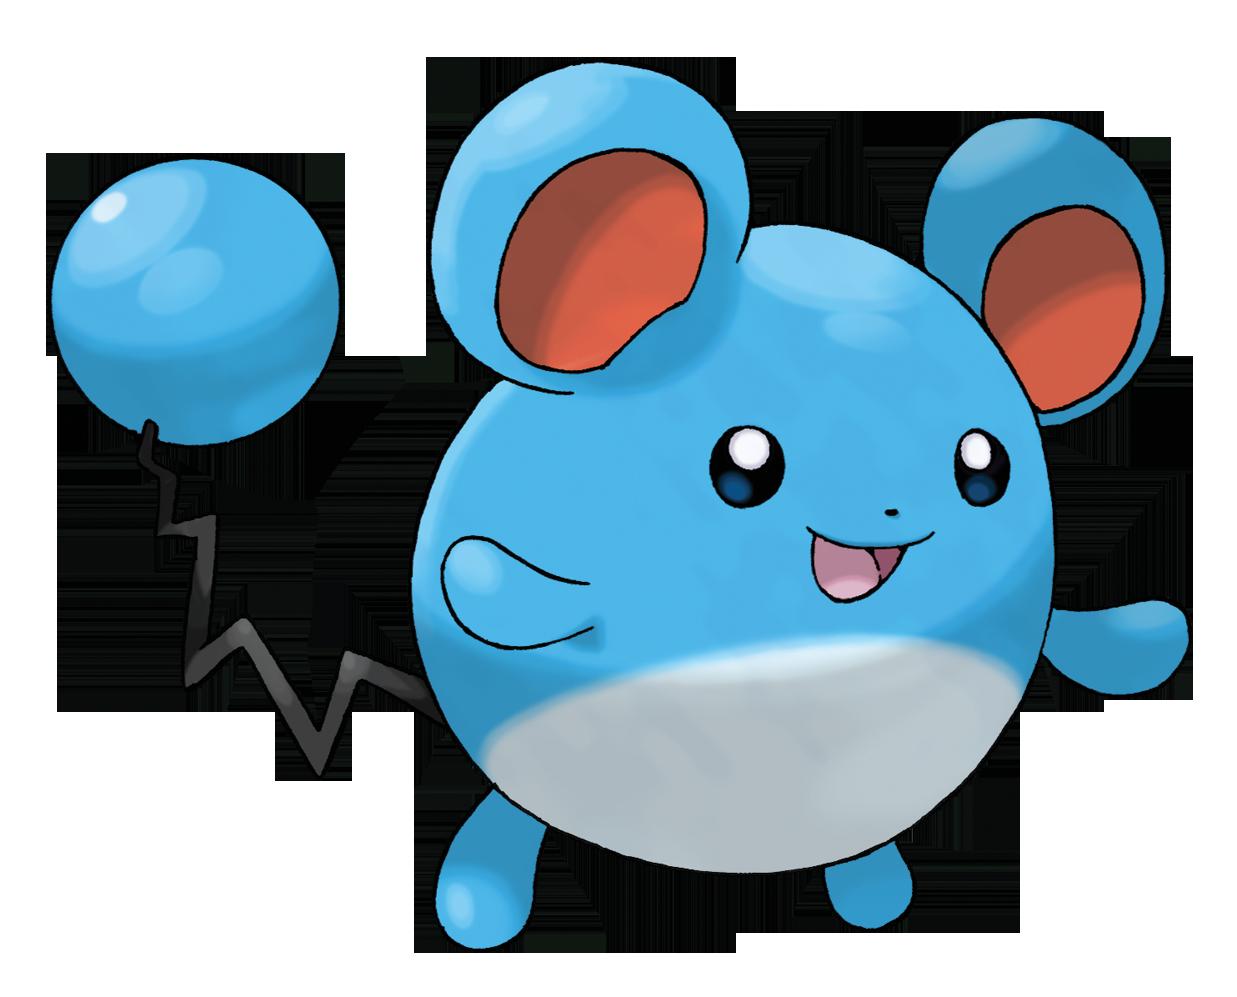 Pokemon Free Download Png PNG Image - Pokemon PNG